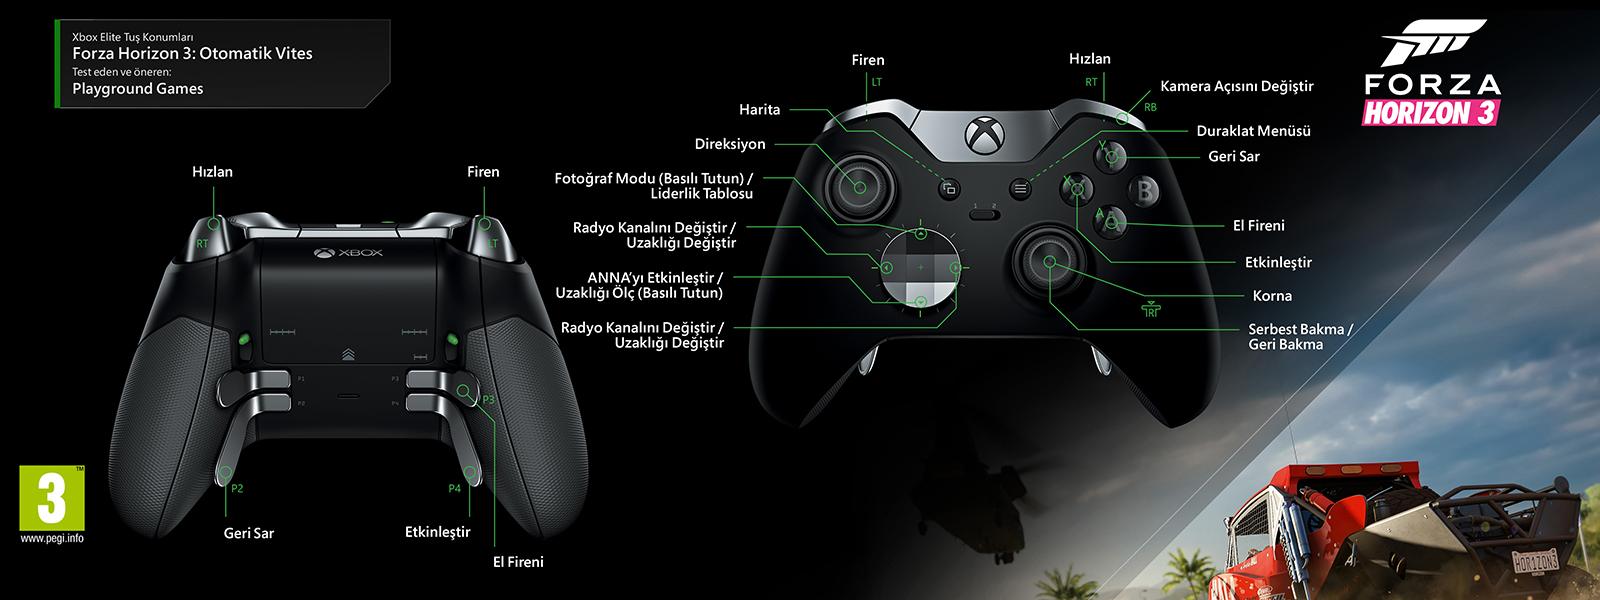 Forza Horizon 3 -Automatic Transmission Elite Kontrol Düzeni